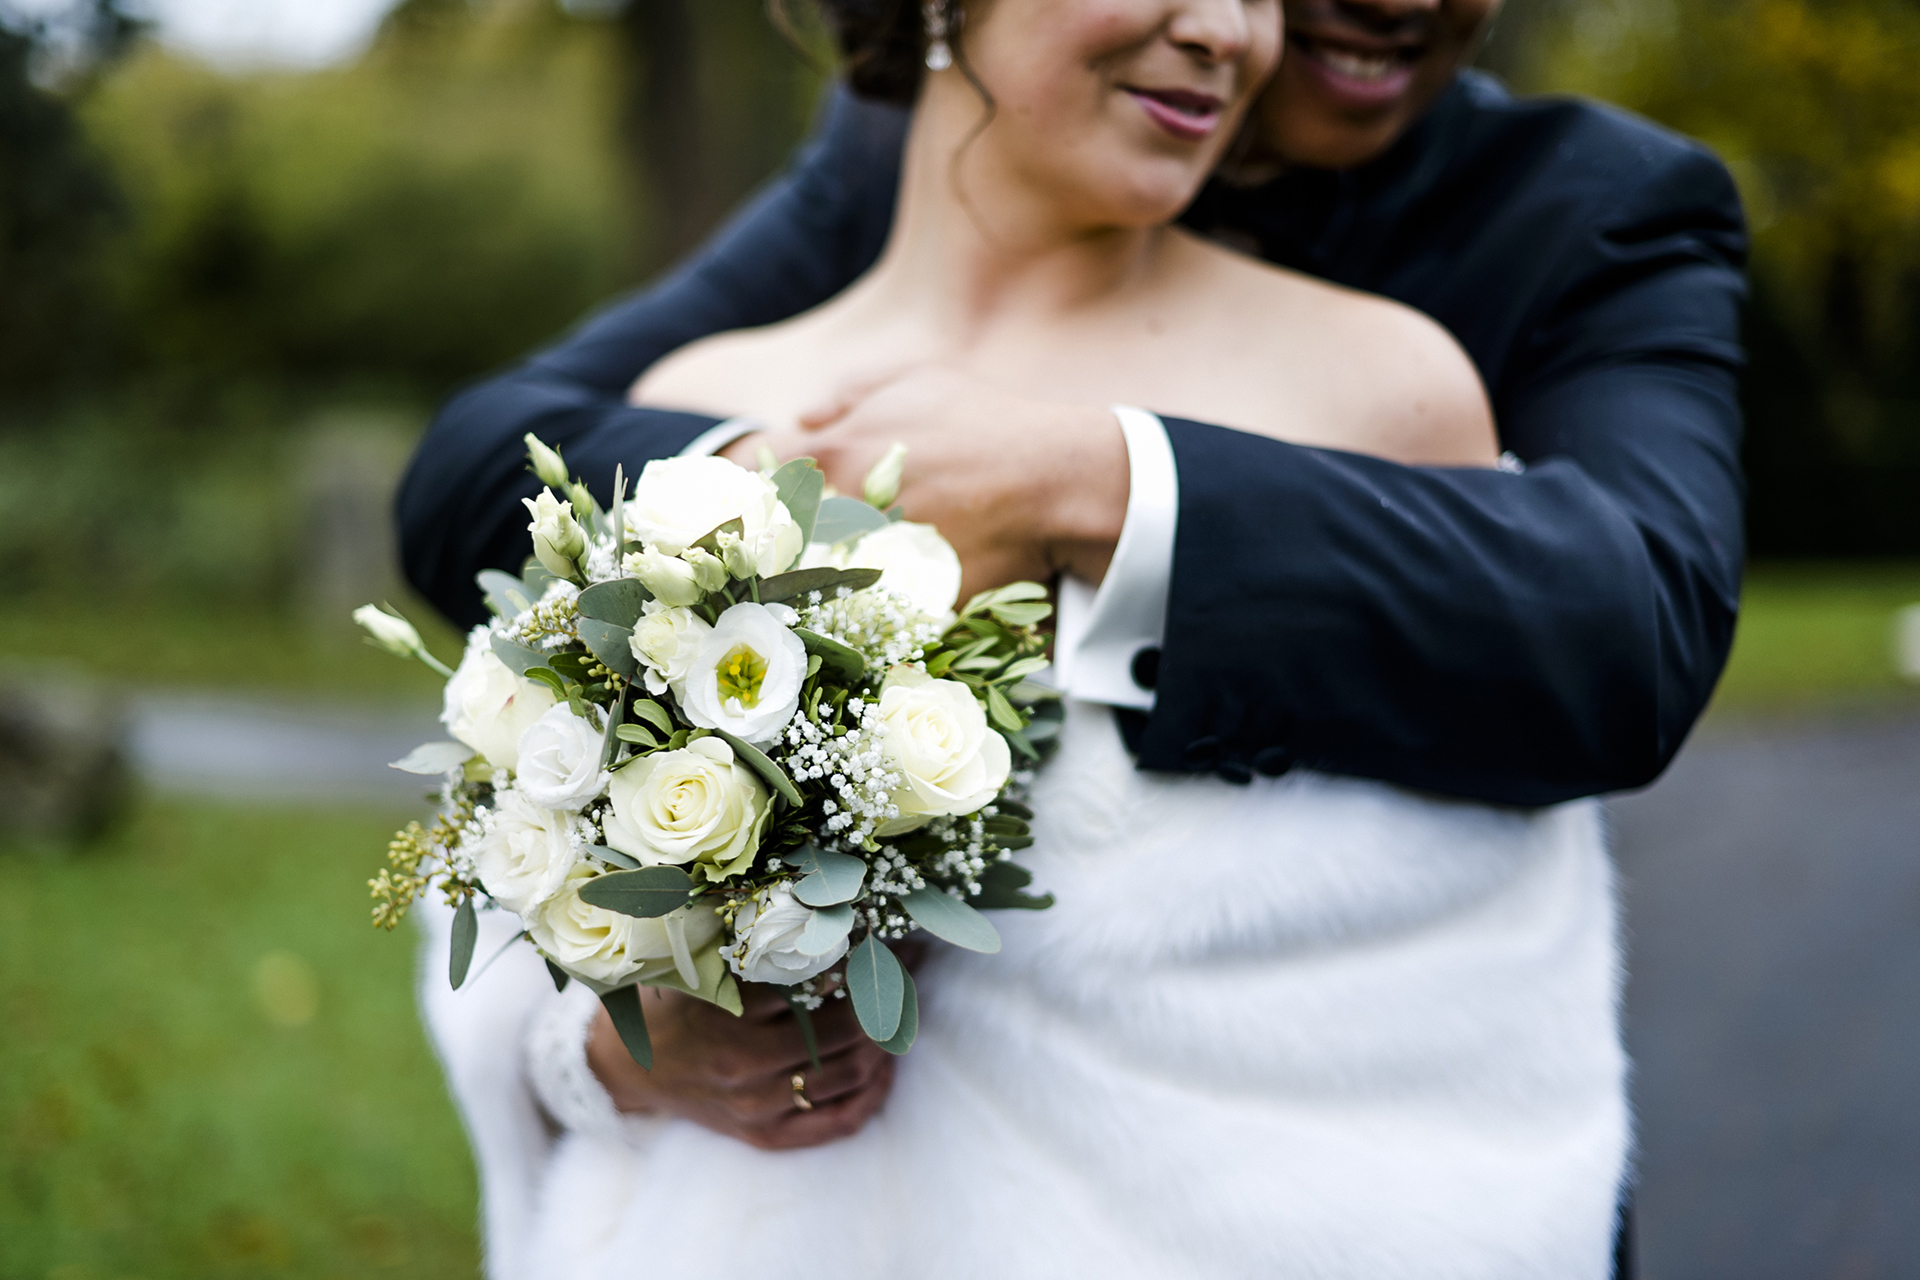 Hochzeitsreportage_J&D_068_Caroline Queda Fotografie